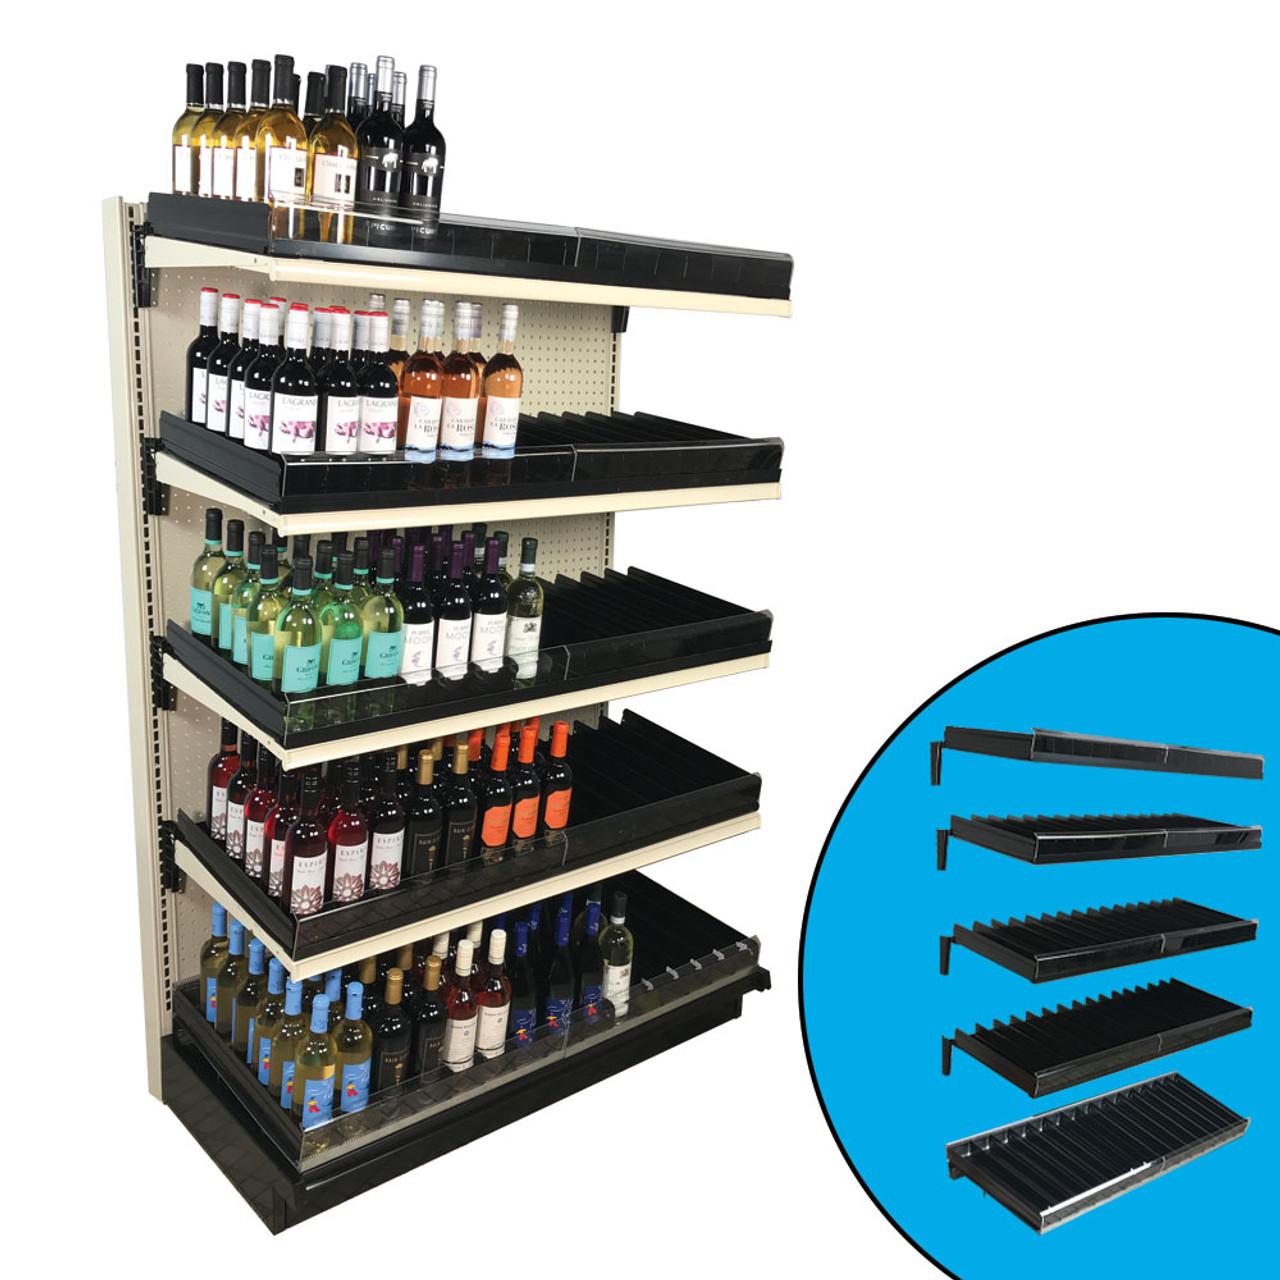 Gravity Feed Shelf Kit Wine Liquor Fits 48 W Gondola 5 Shelves